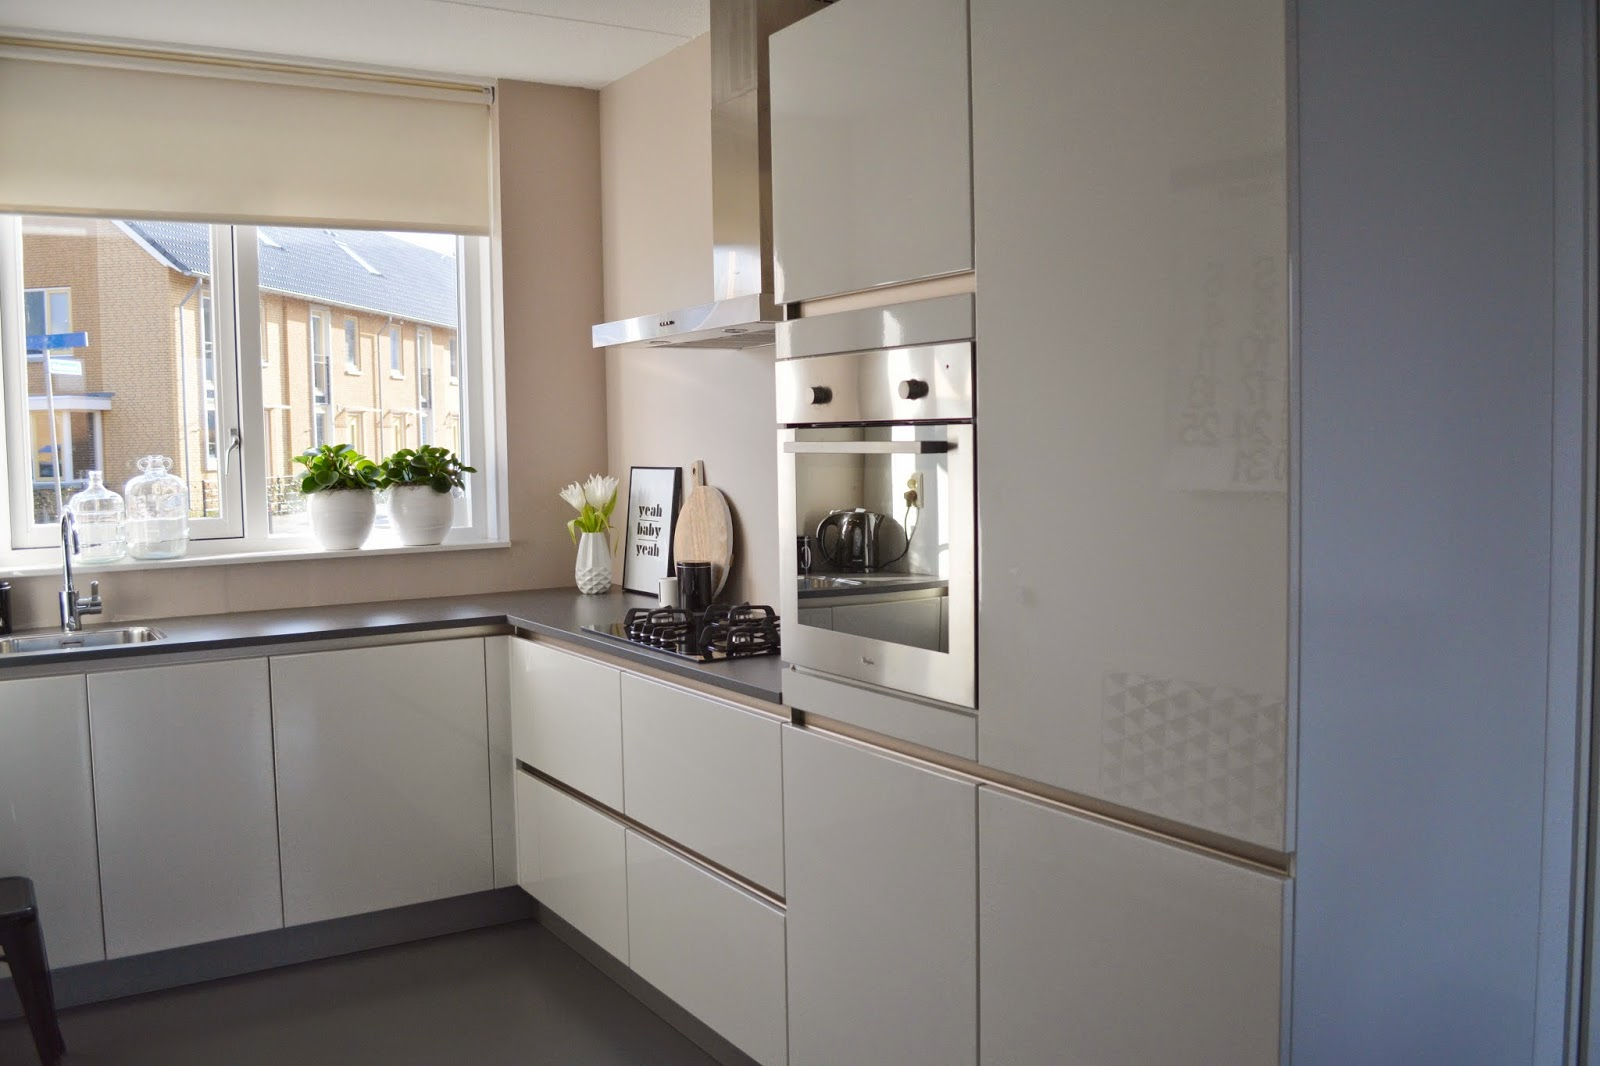 Saved with style interieur een kijkje in ons huis 1 keuken - Keuken ontwikkeling in l ...